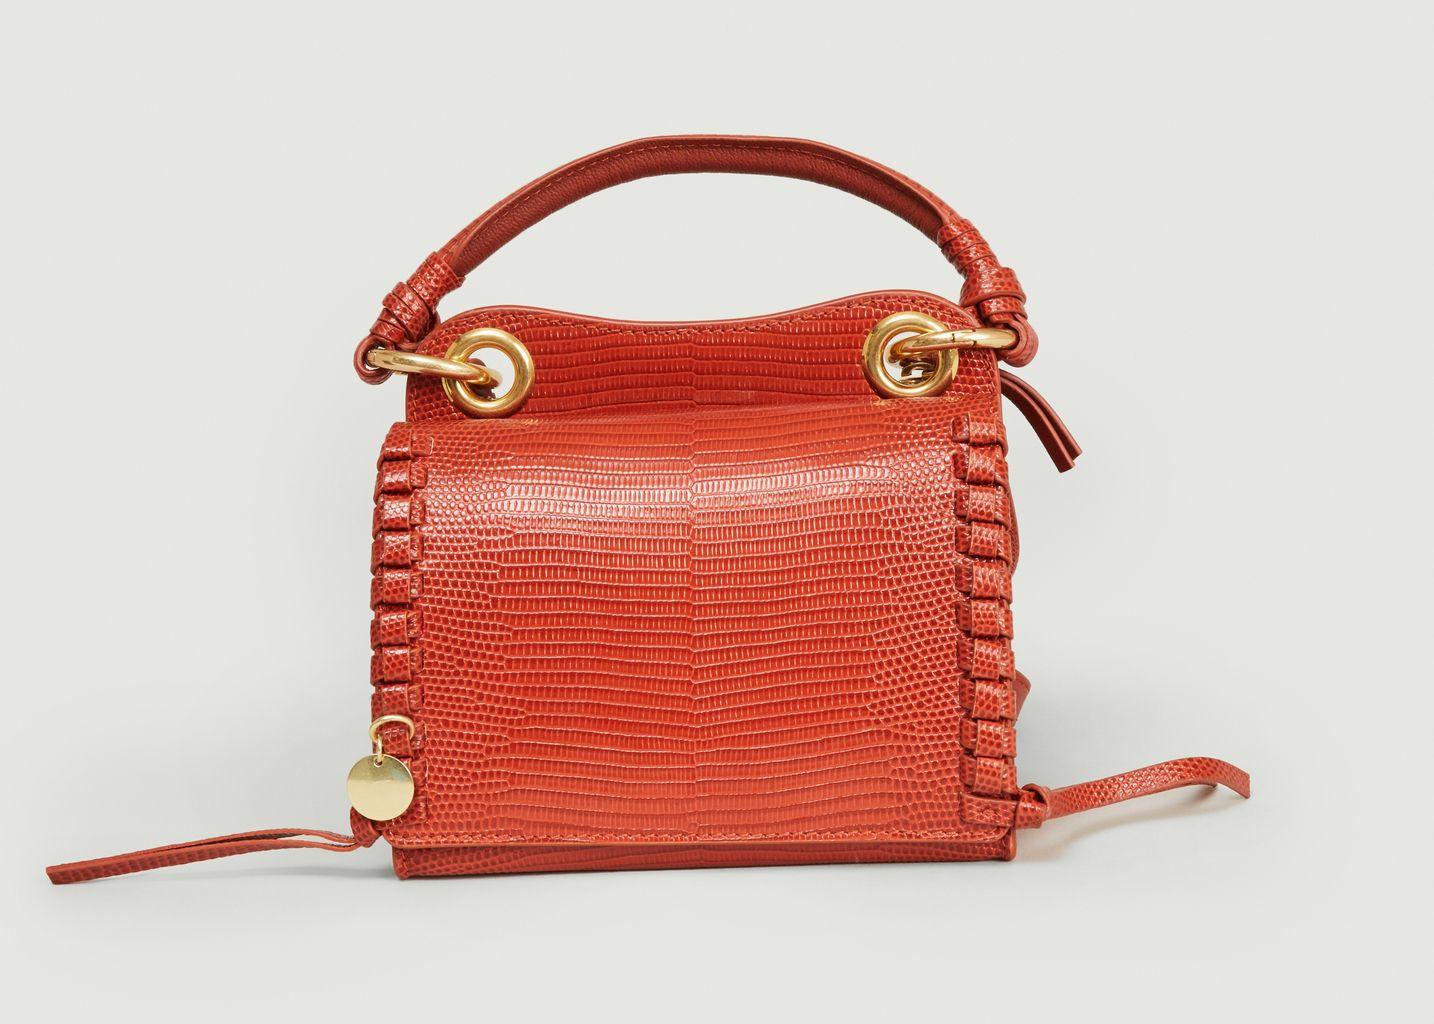 Mini sac en cuir Tilda - See by Chloé